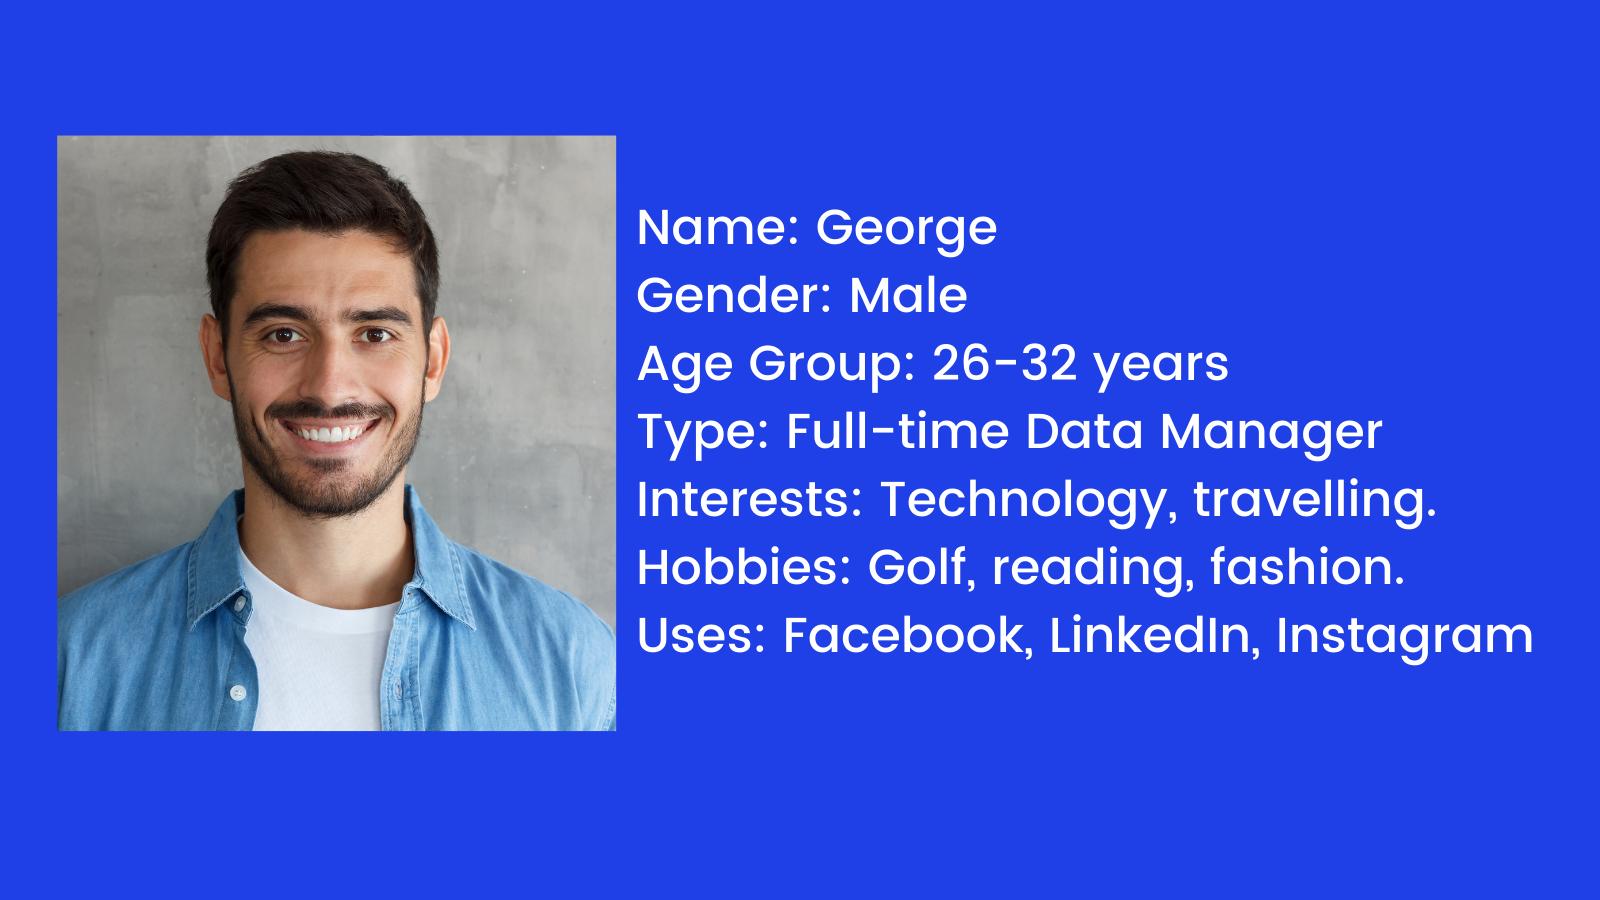 Image of a male with a descriptive persona